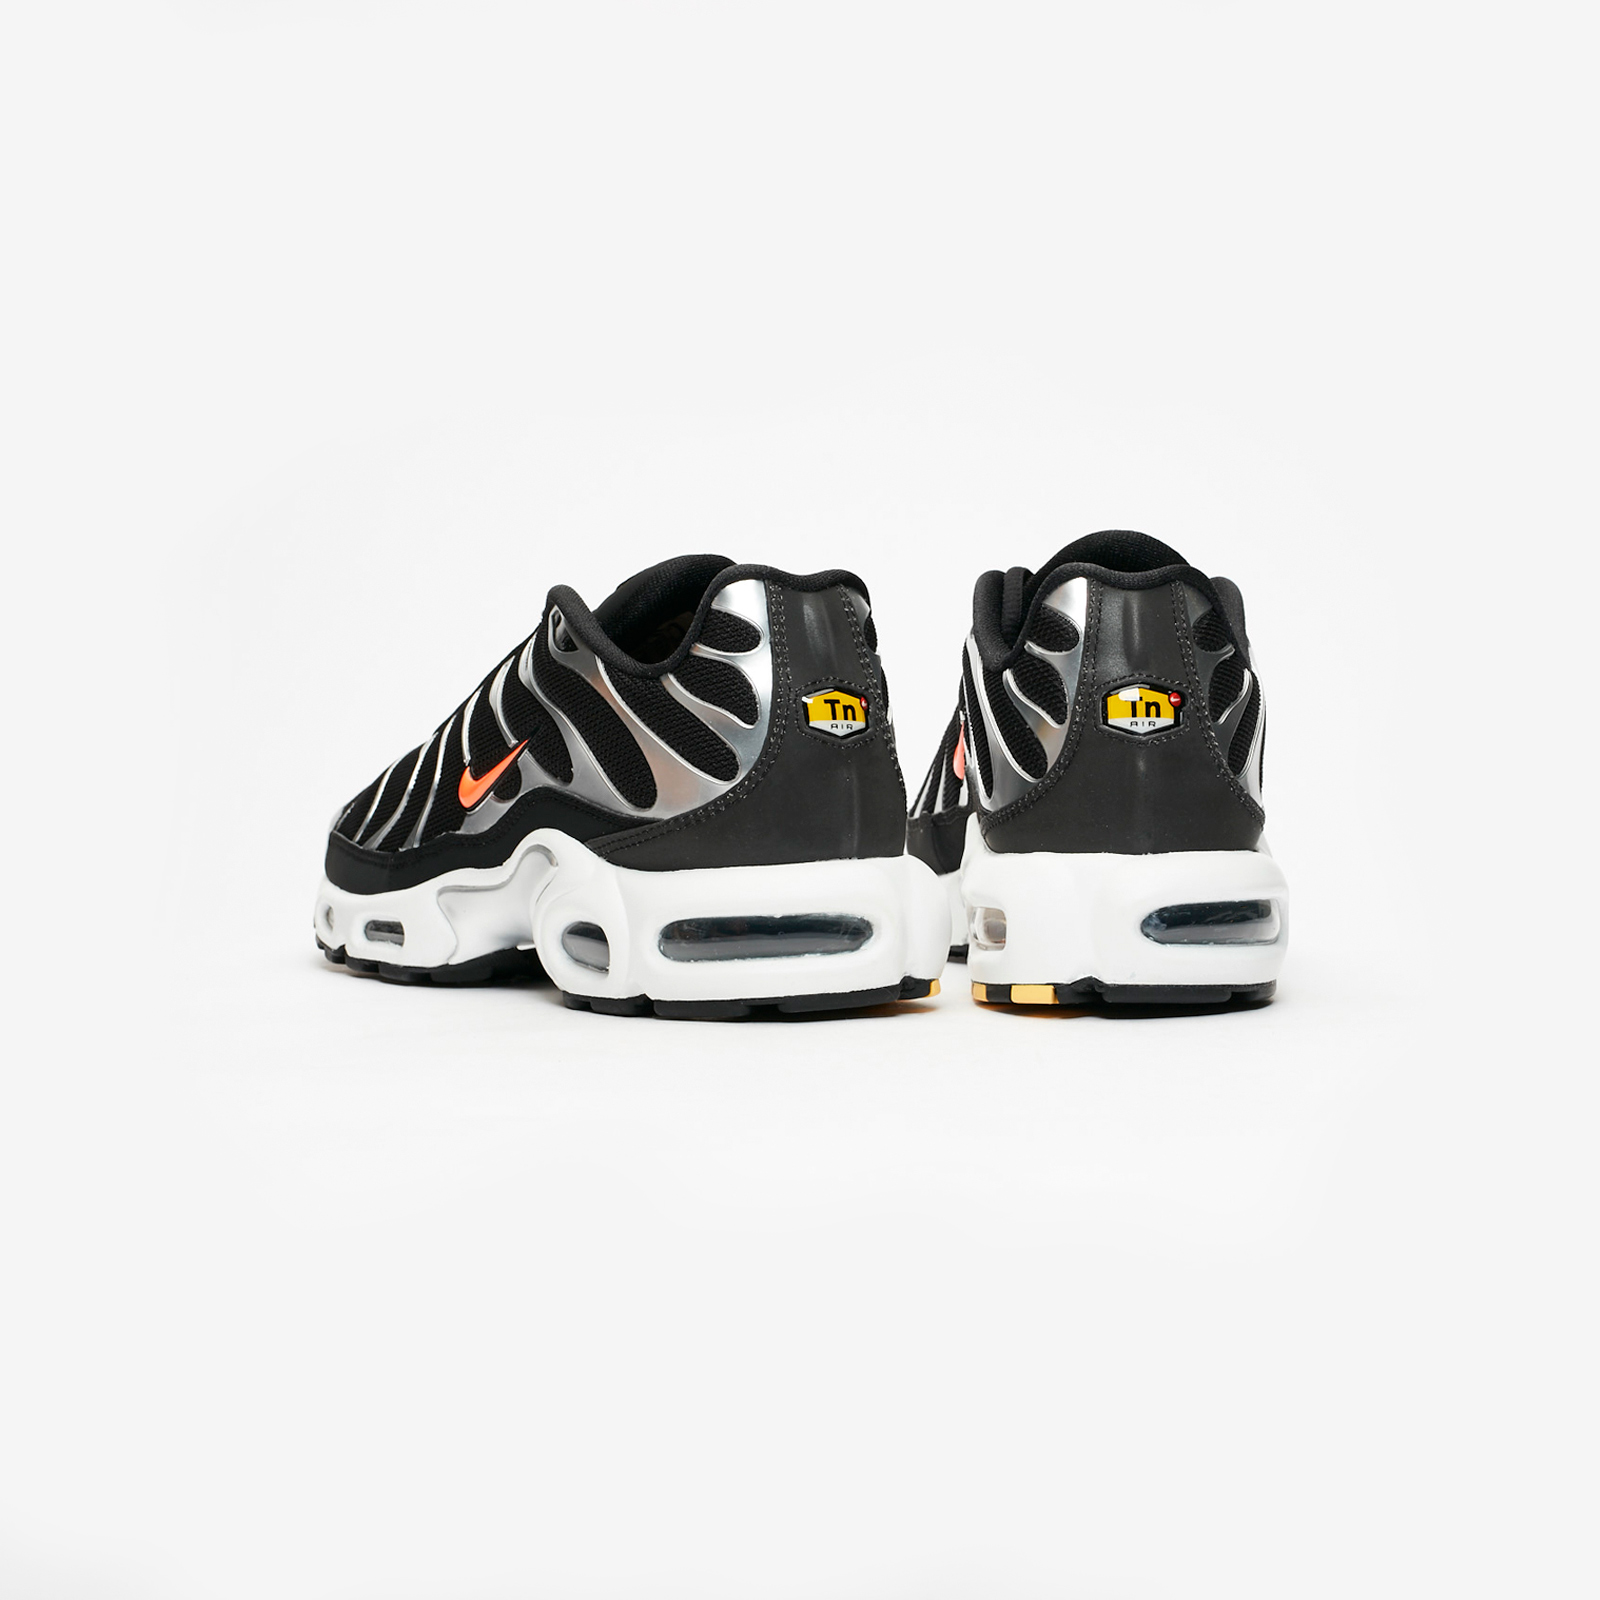 Nike Air Max Plus TN SE Cd1533 001 Sneakersnstuff